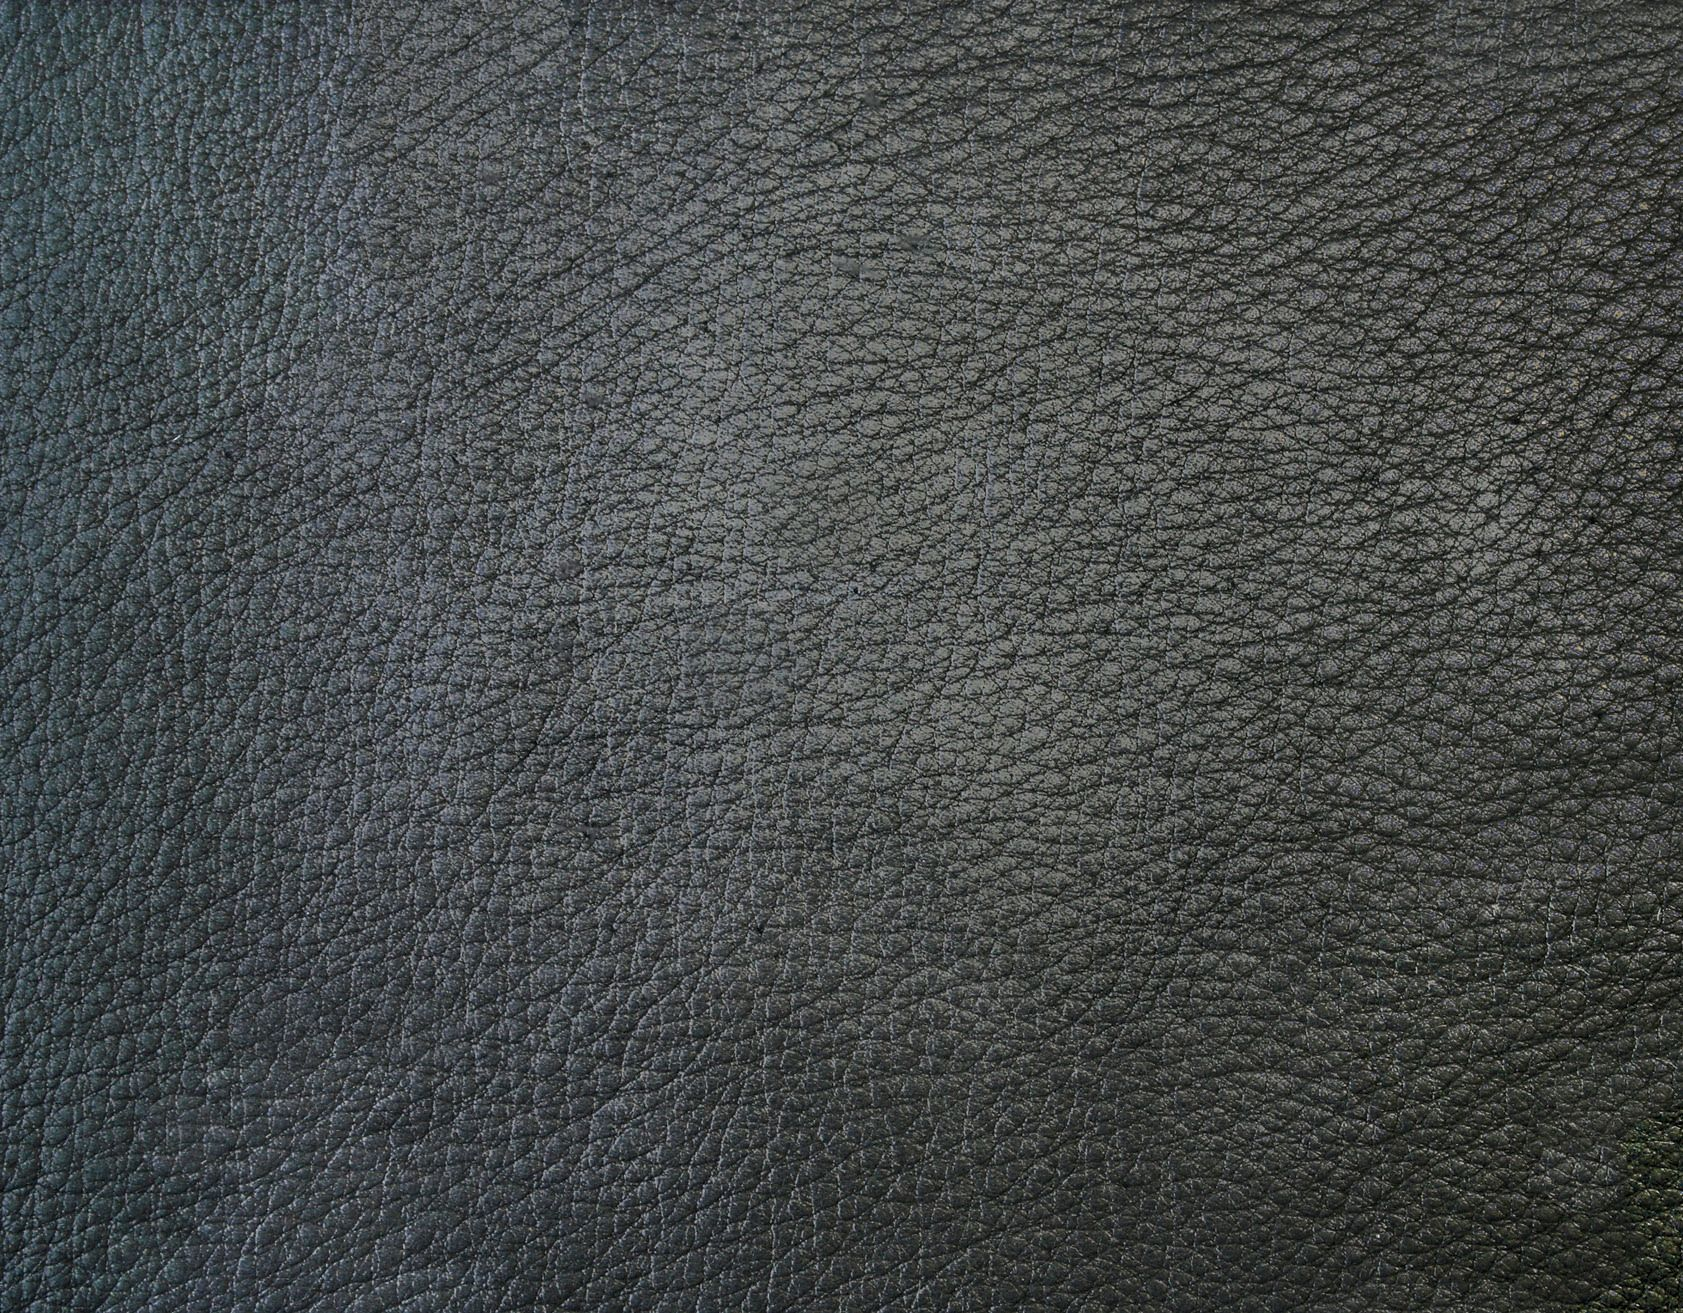 Black Elephant Skin Looks 12 Leather texture Texture packs 1683x1313